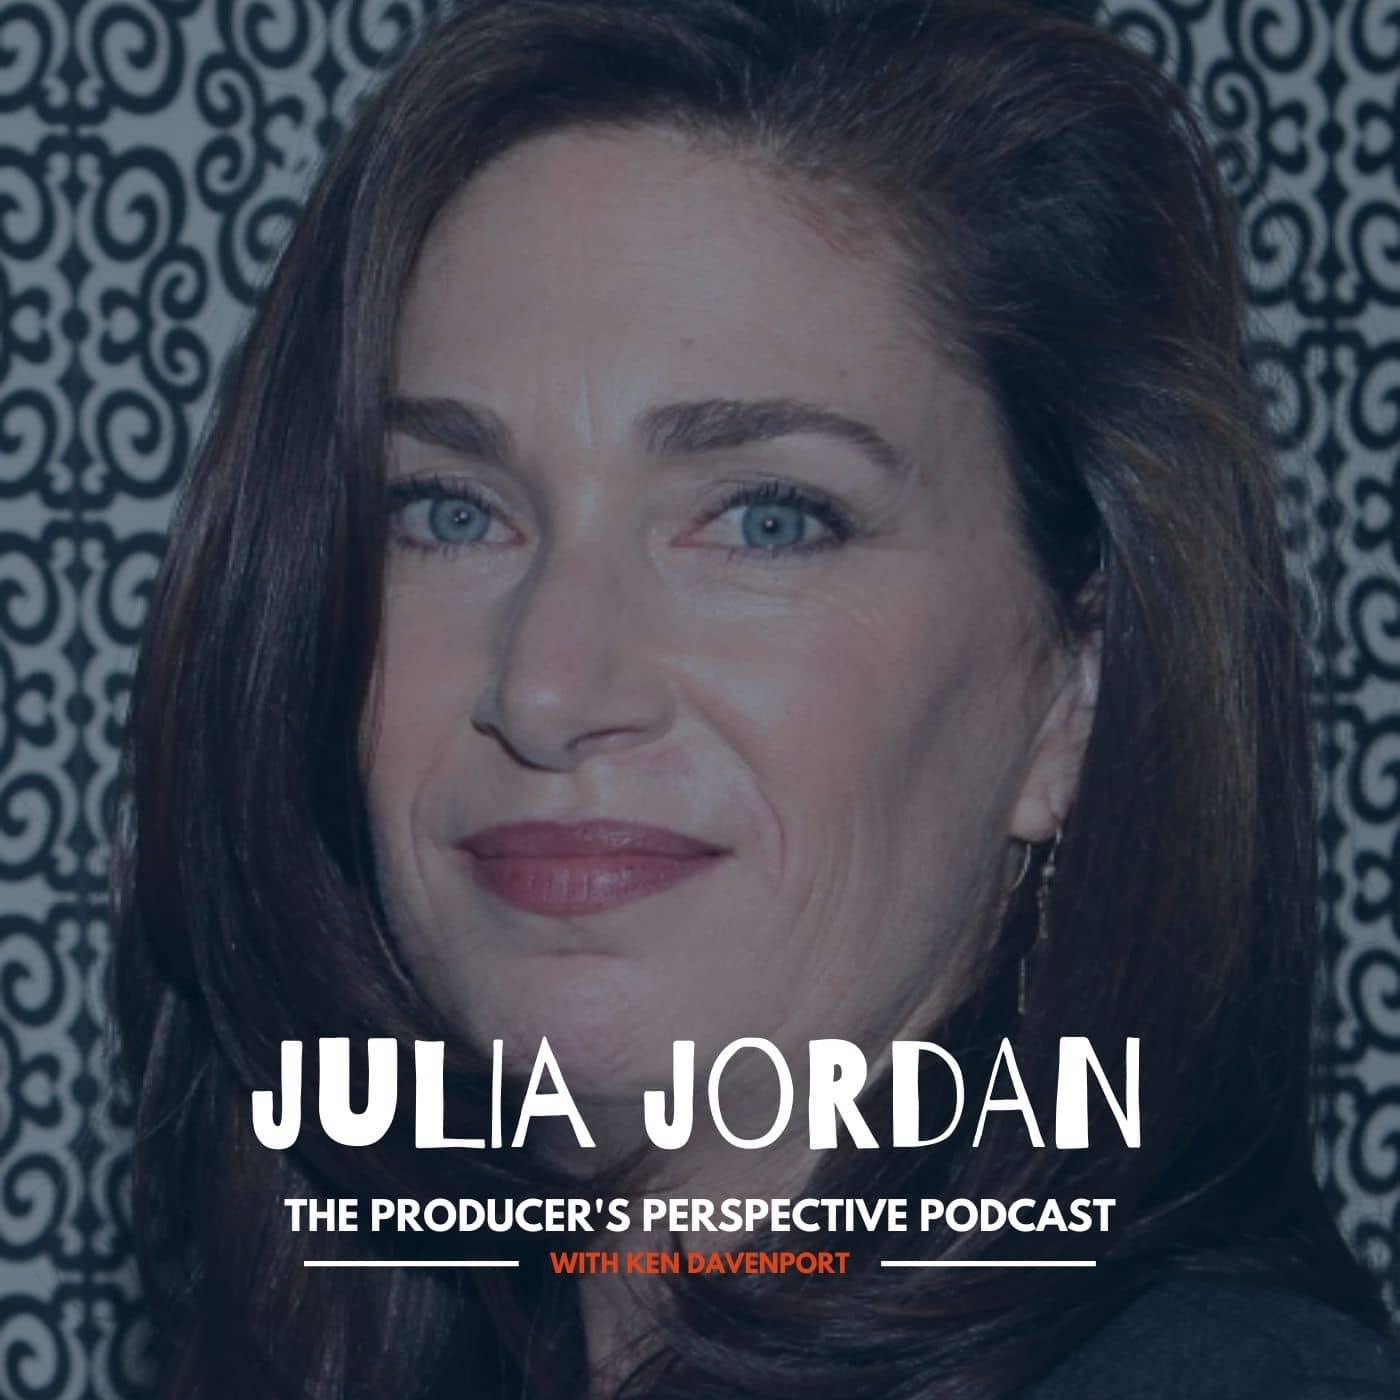 Ken Davenport's The Producer's Perspective Podcast Episode 185 - Julia Jordan